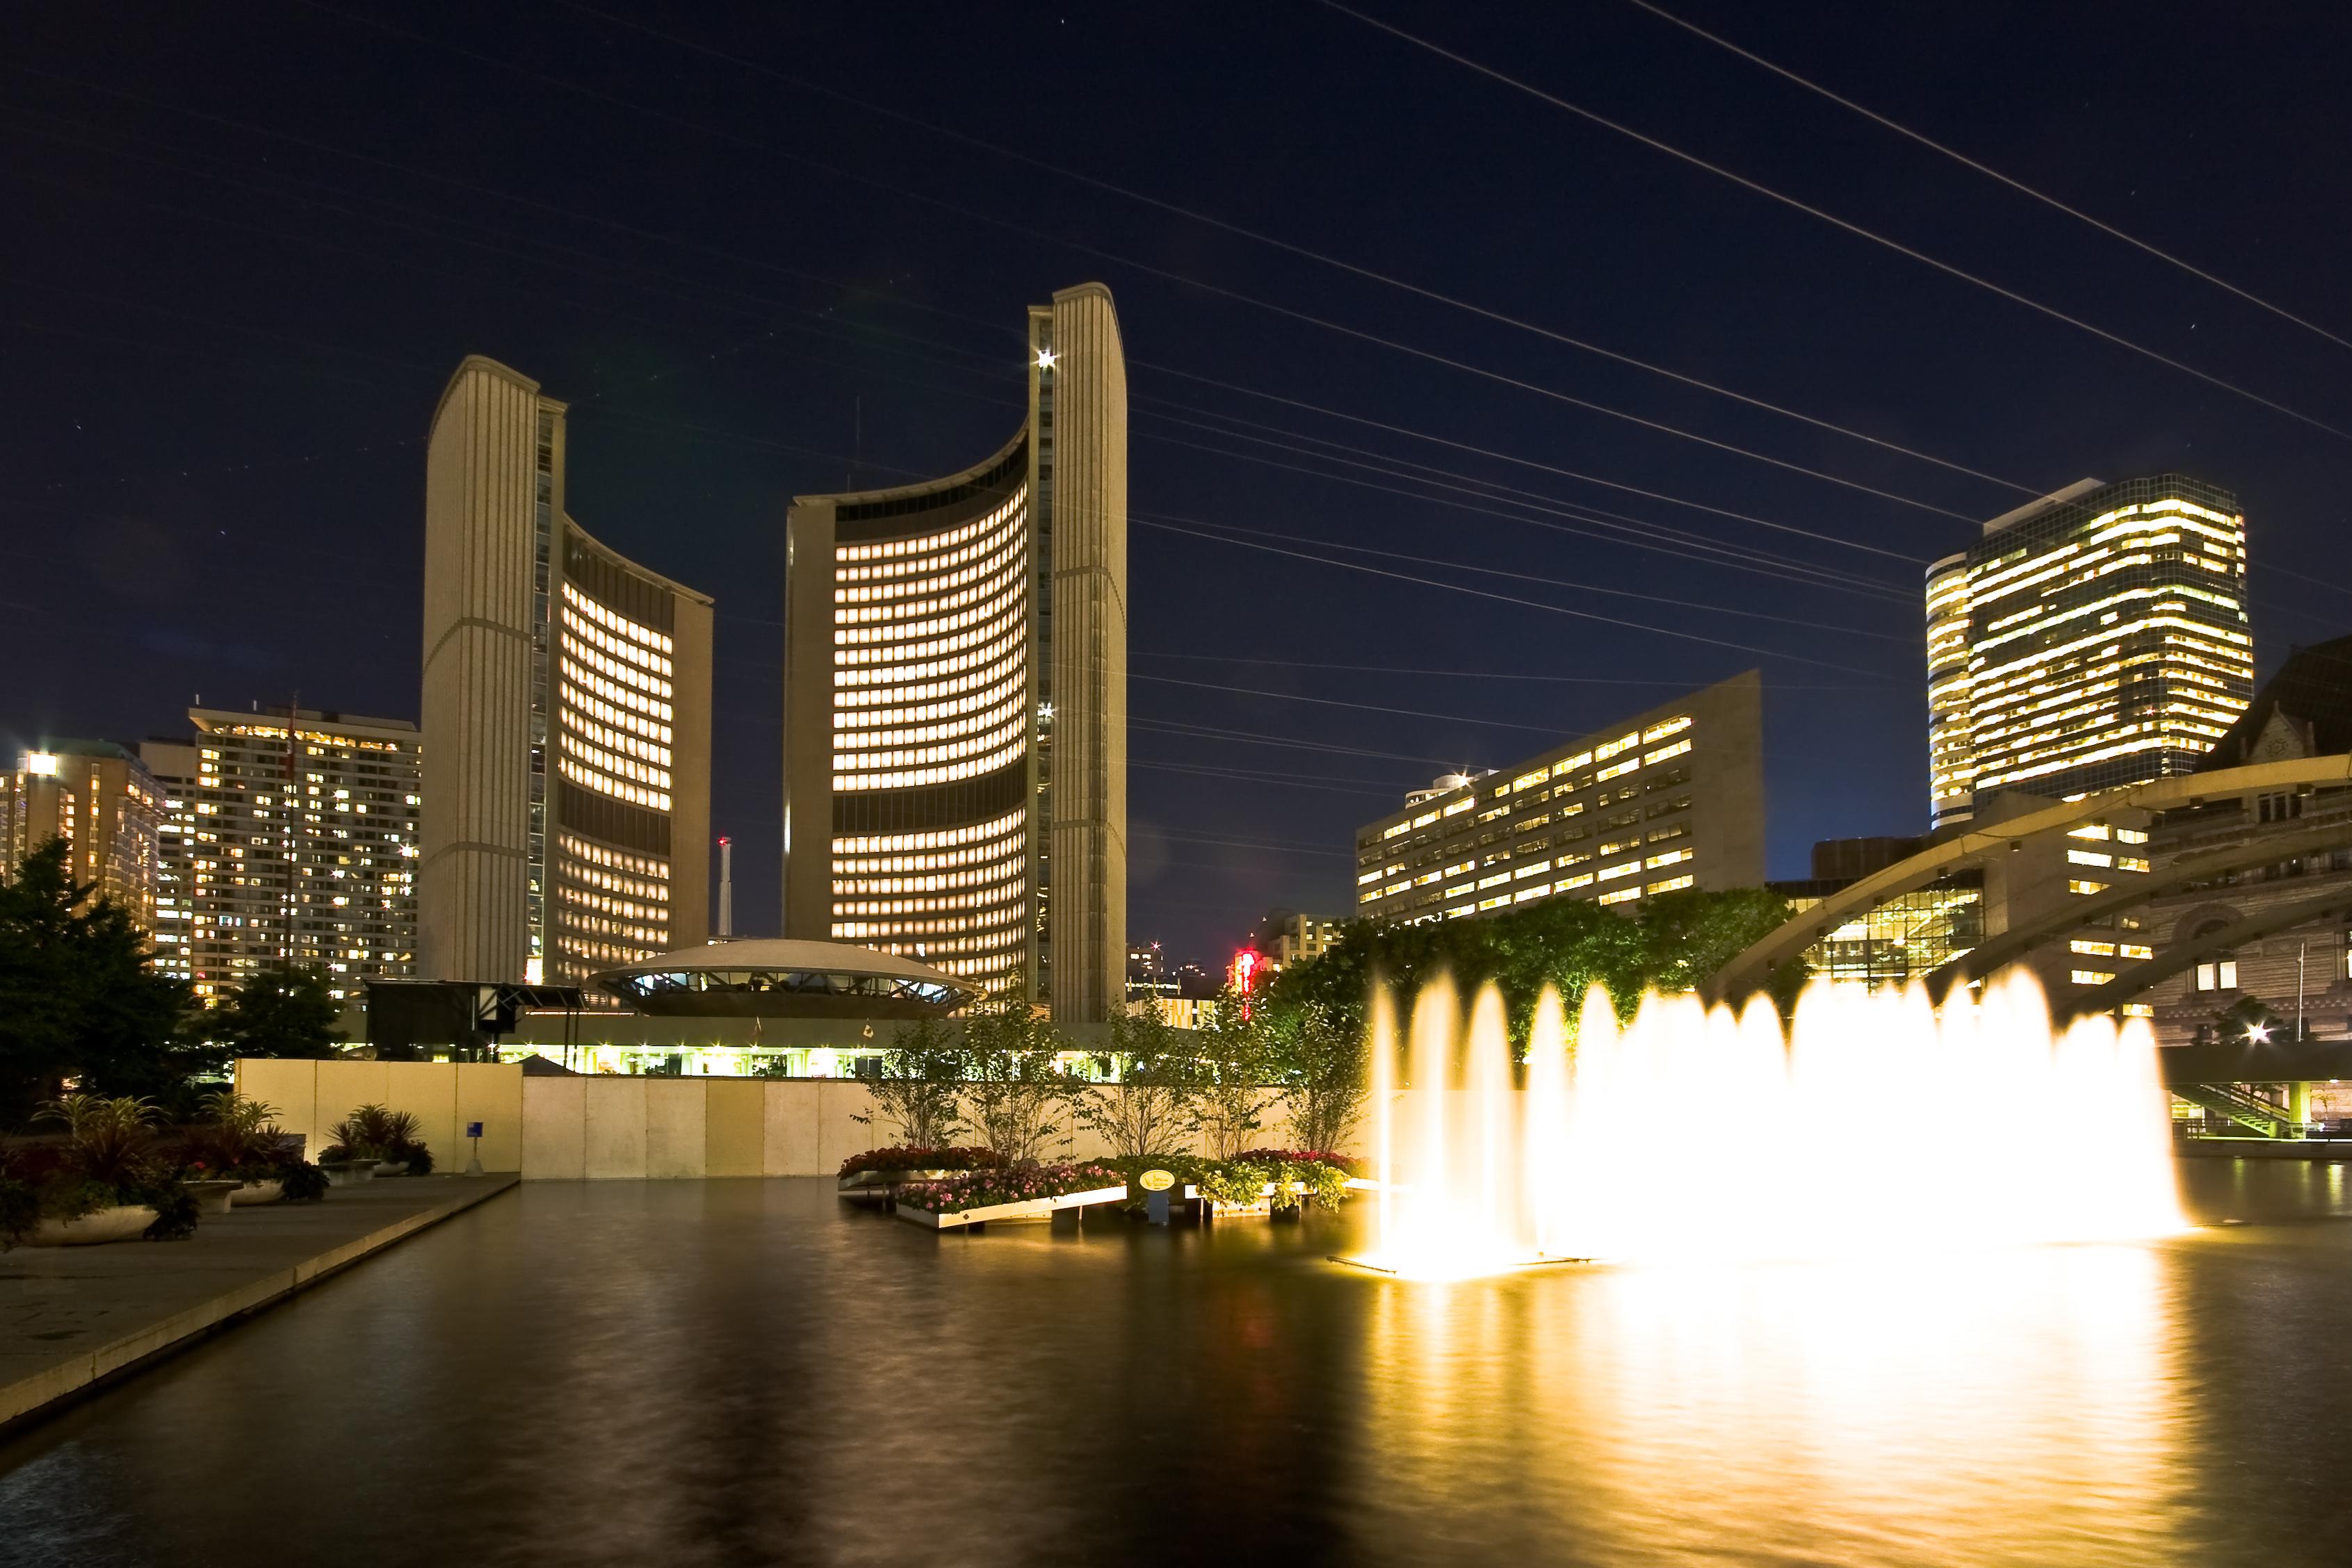 <a href='http://www.ticketsreview.com/toronto.html'>Toronto tickets</a>